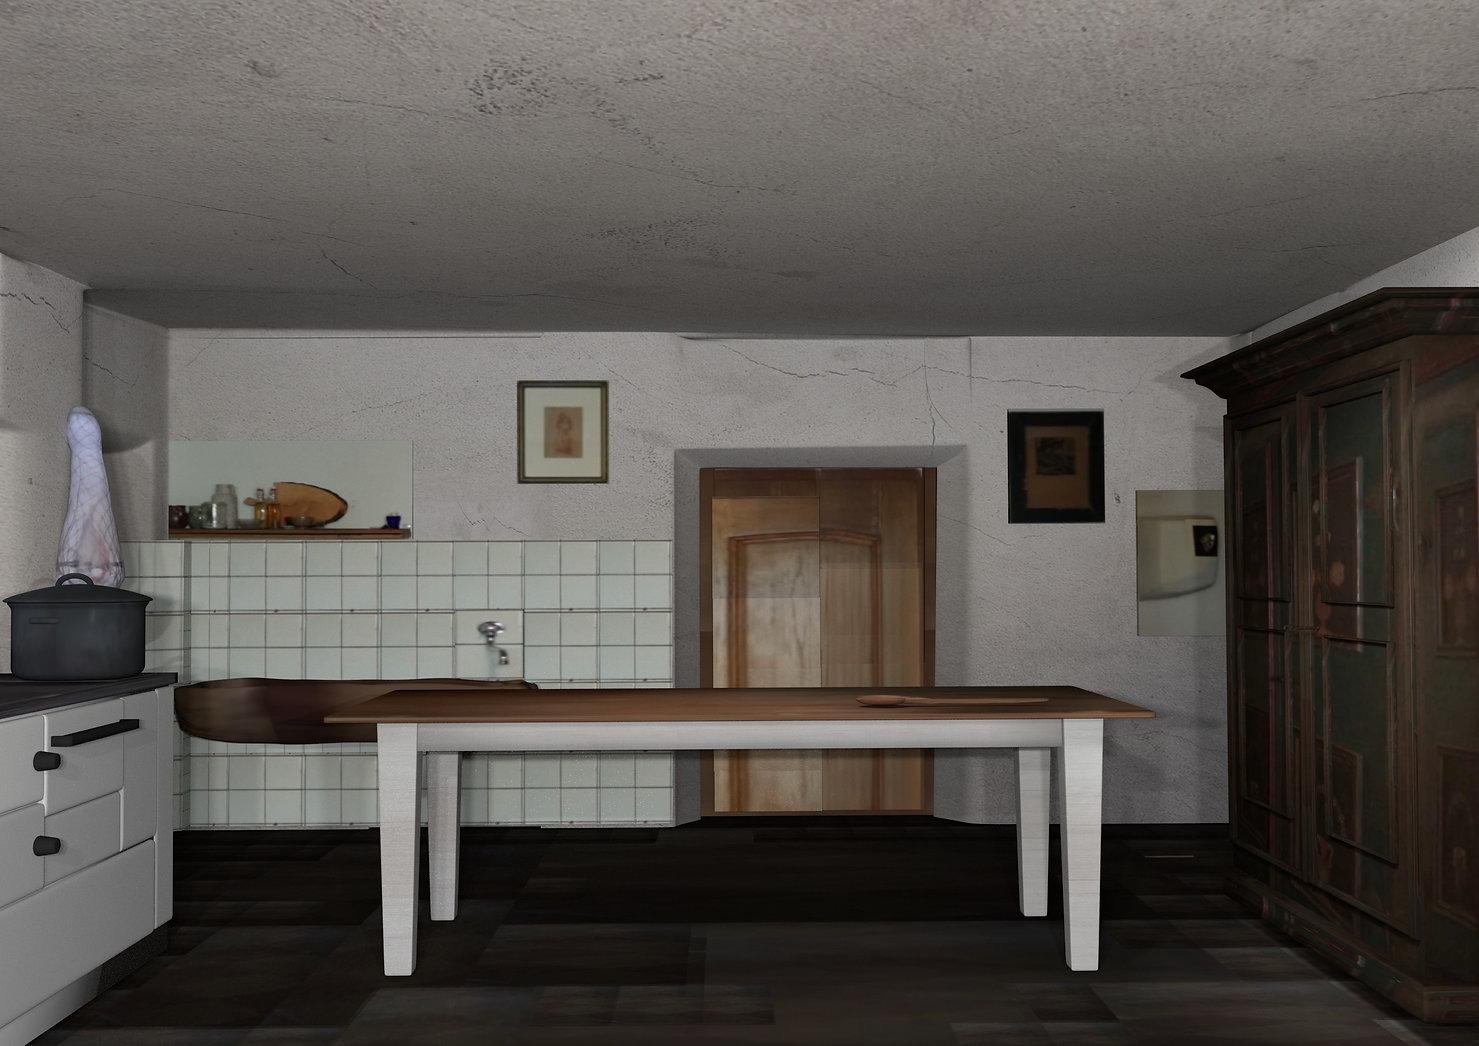 kücheoteigk.jpg